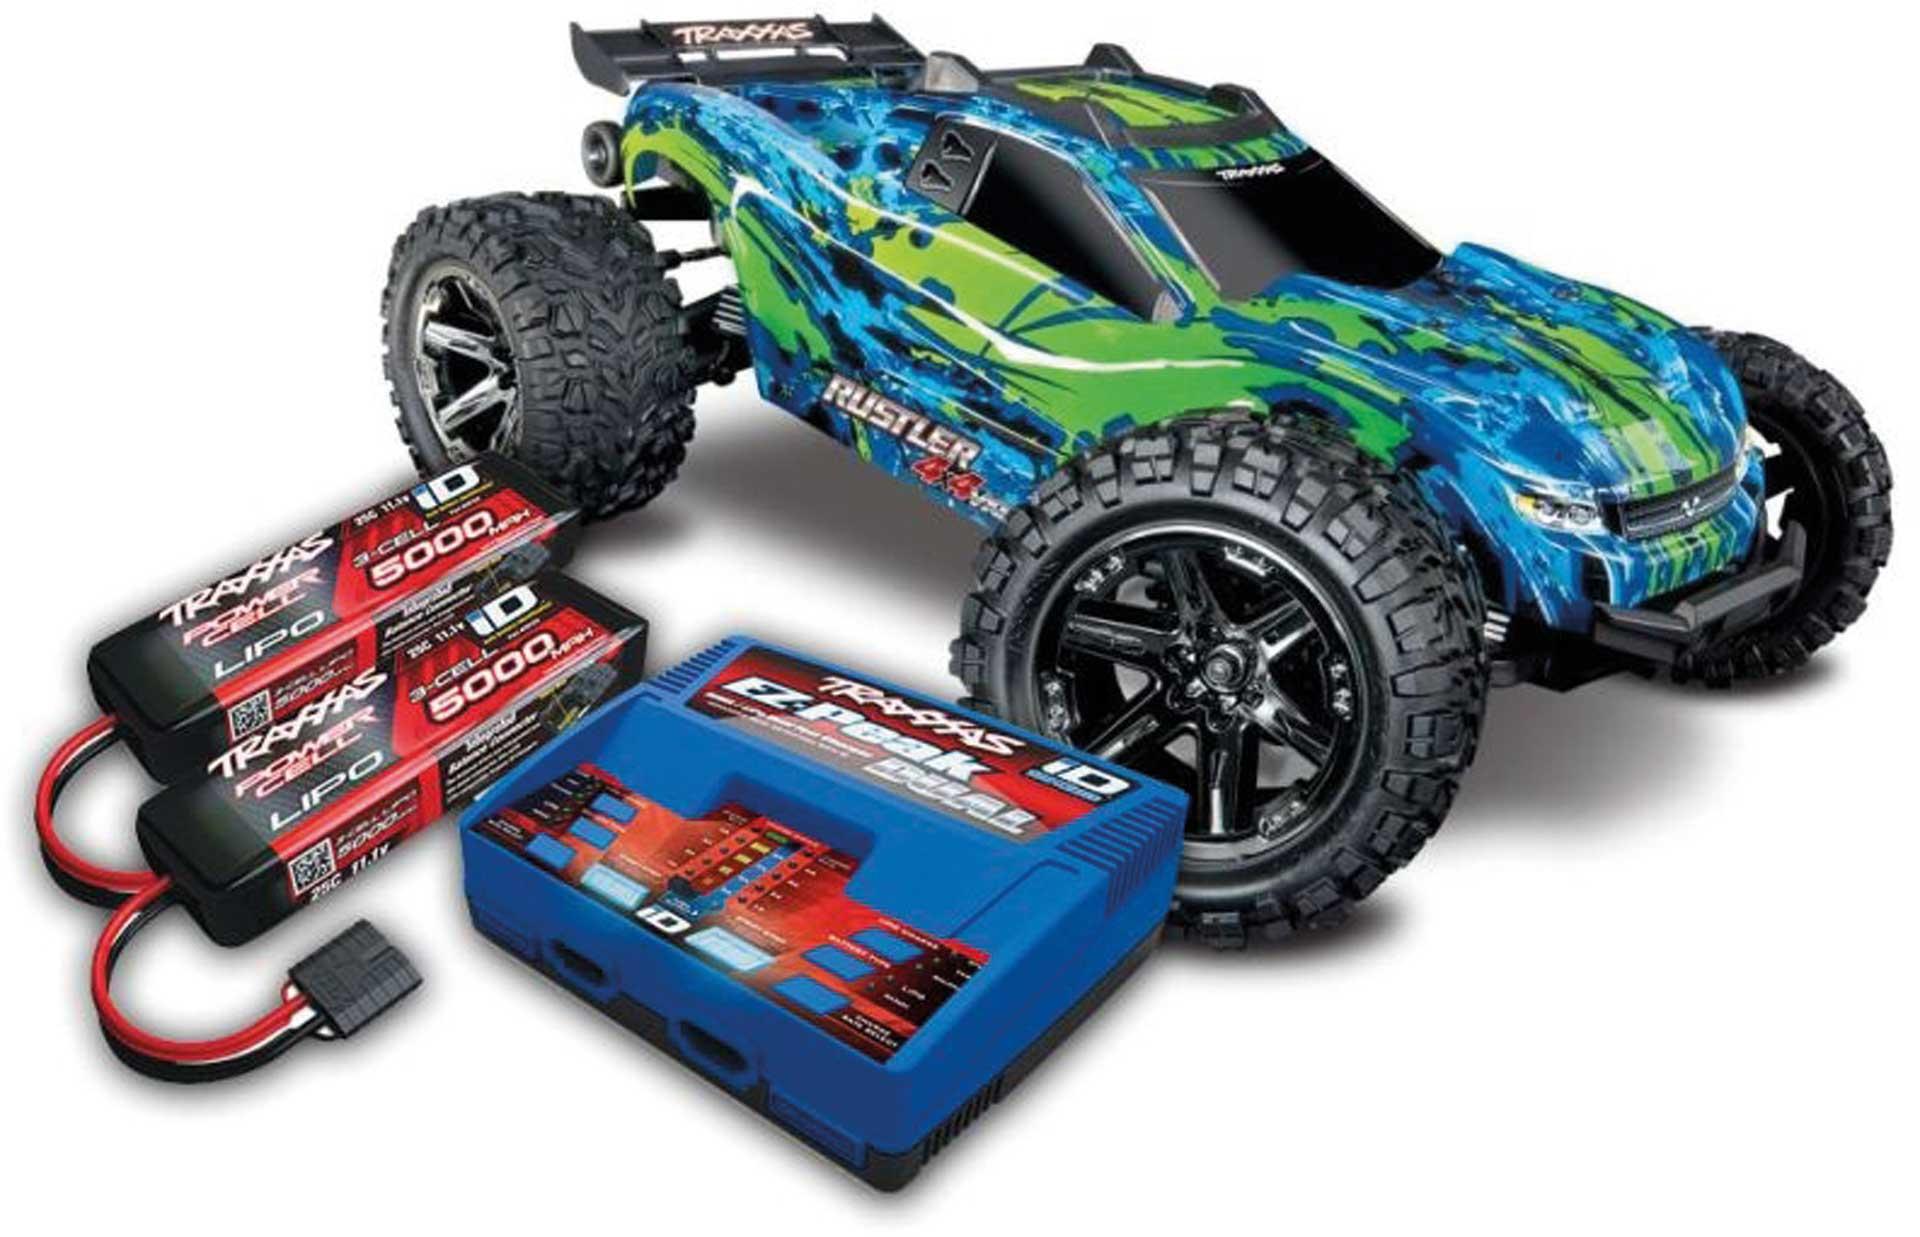 TRAXXAS RUSTLER 4X4 VXL BRUSHLESS GR/BL RTR MIT AKKU/LADER-SET *AKTION* 1/10 4WD STADIUM TRUCK (TRX67076-4 + TRX2990GX)